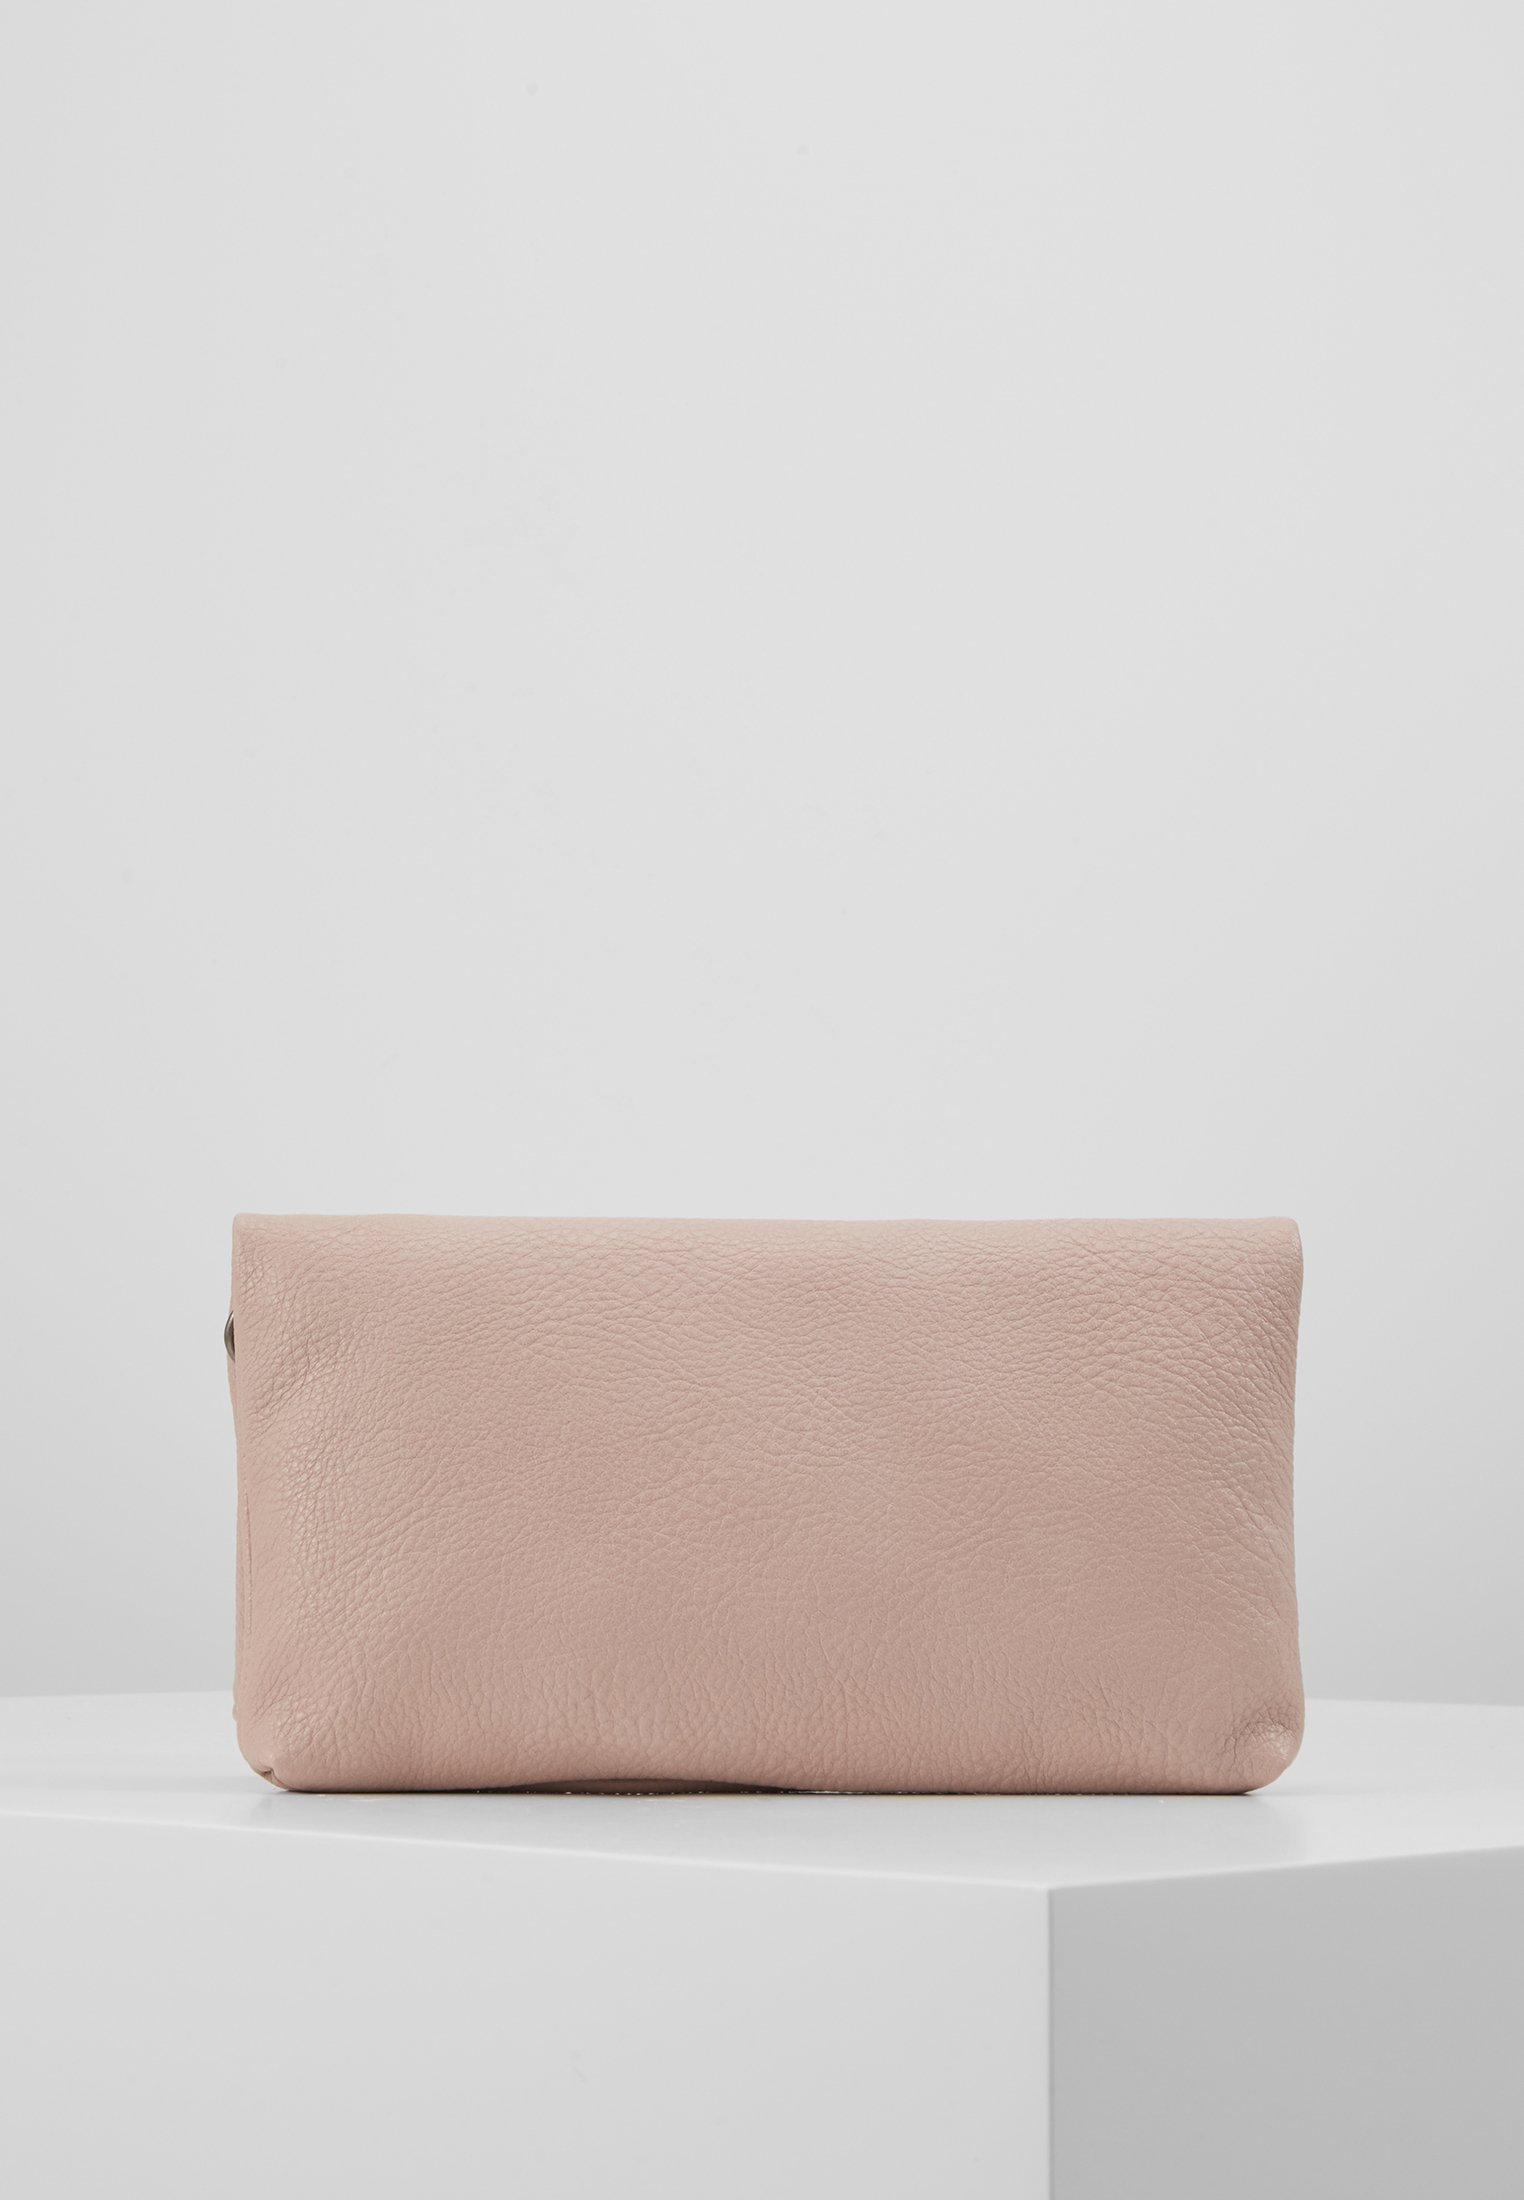 Who What Wear CHARA Skulderveske light pink Zalando.no